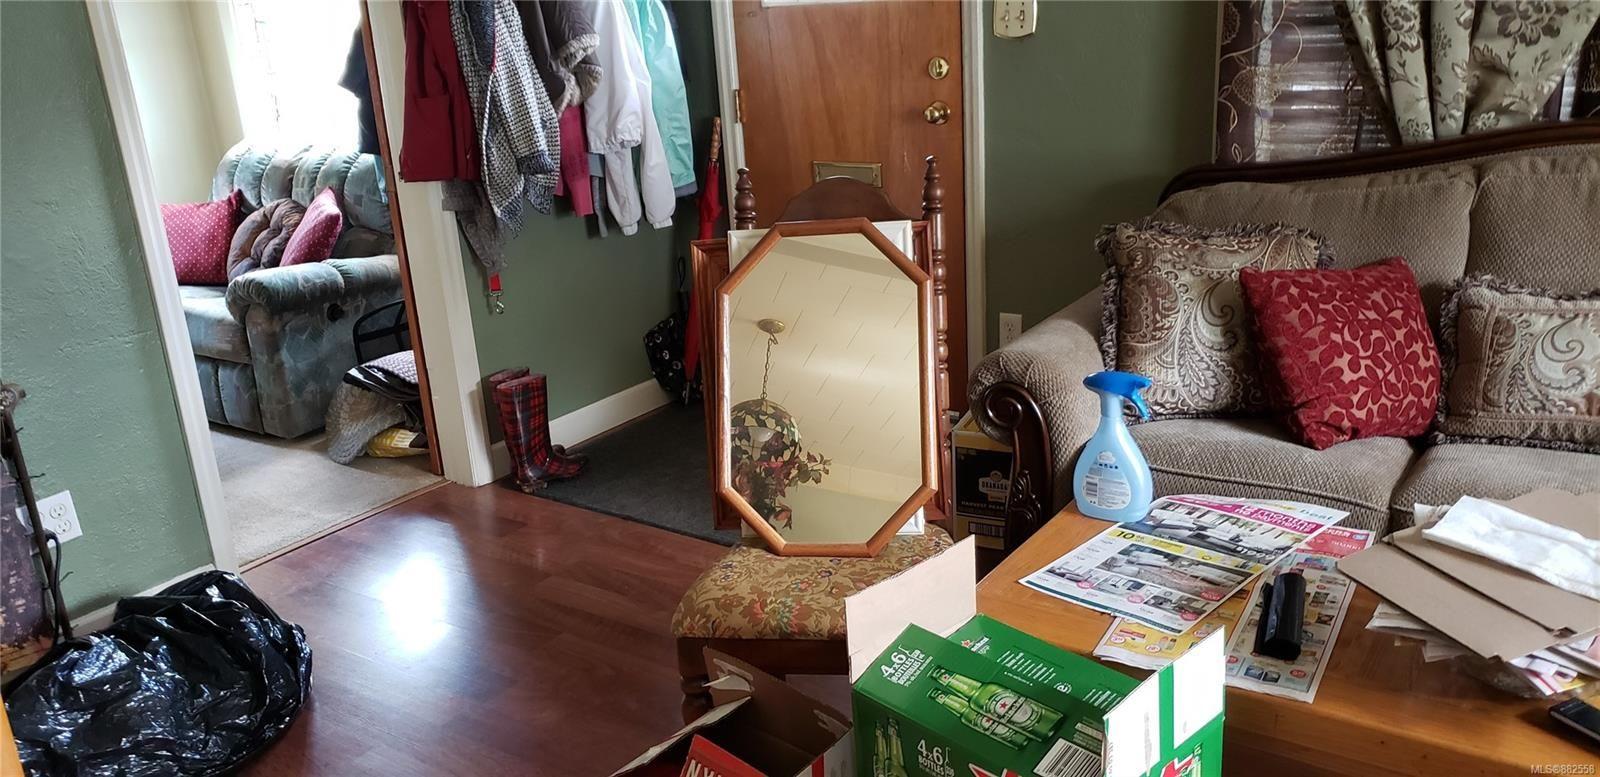 Photo 8: Photos: 2686 6th Ave in : PA Port Alberni House for sale (Port Alberni)  : MLS®# 882558